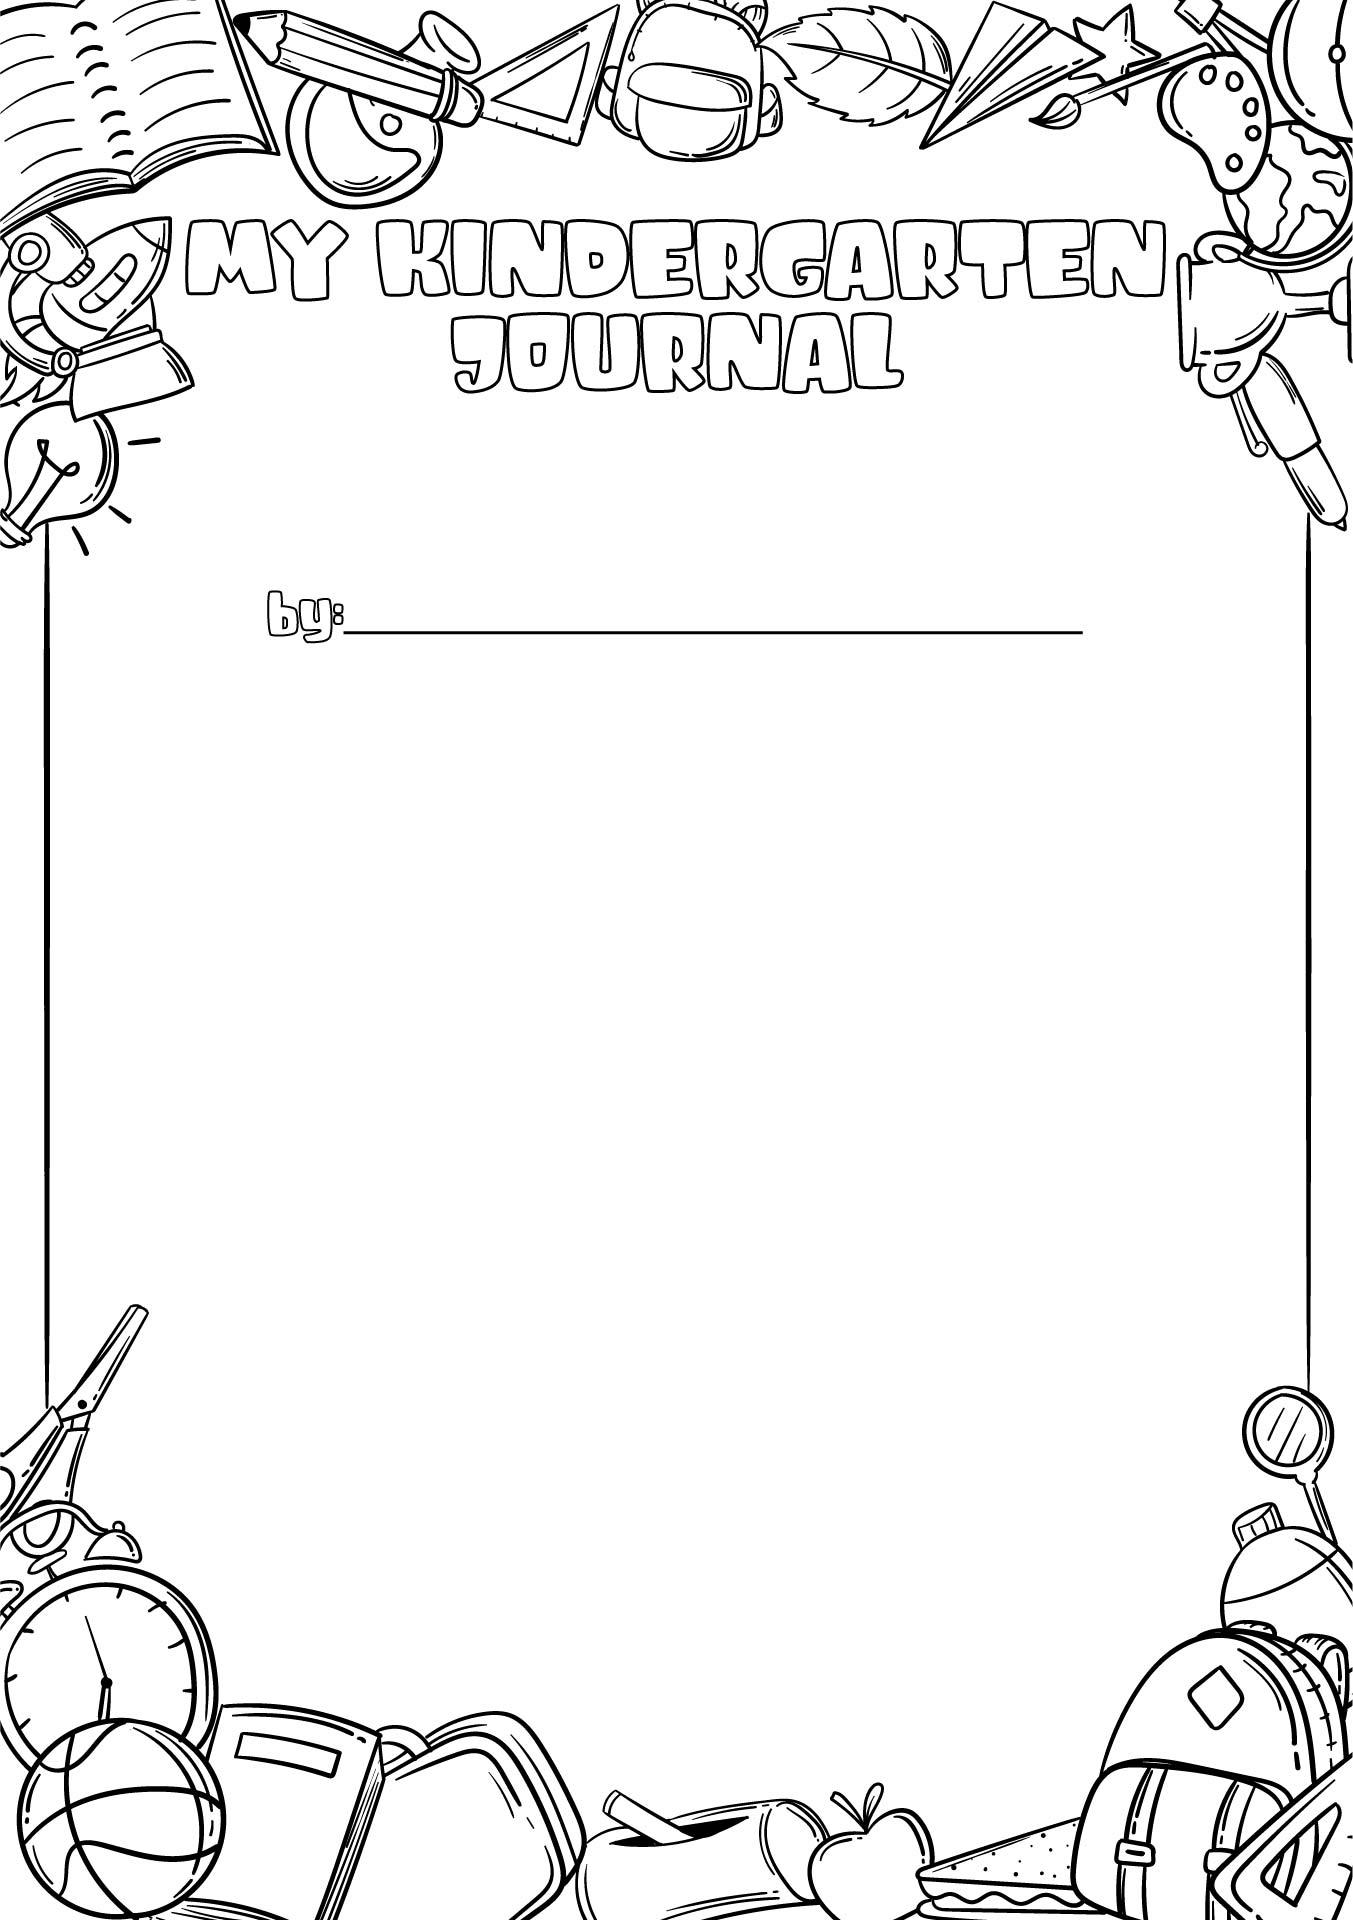 5 Best Images of Printable Kindergarten Journal Covers